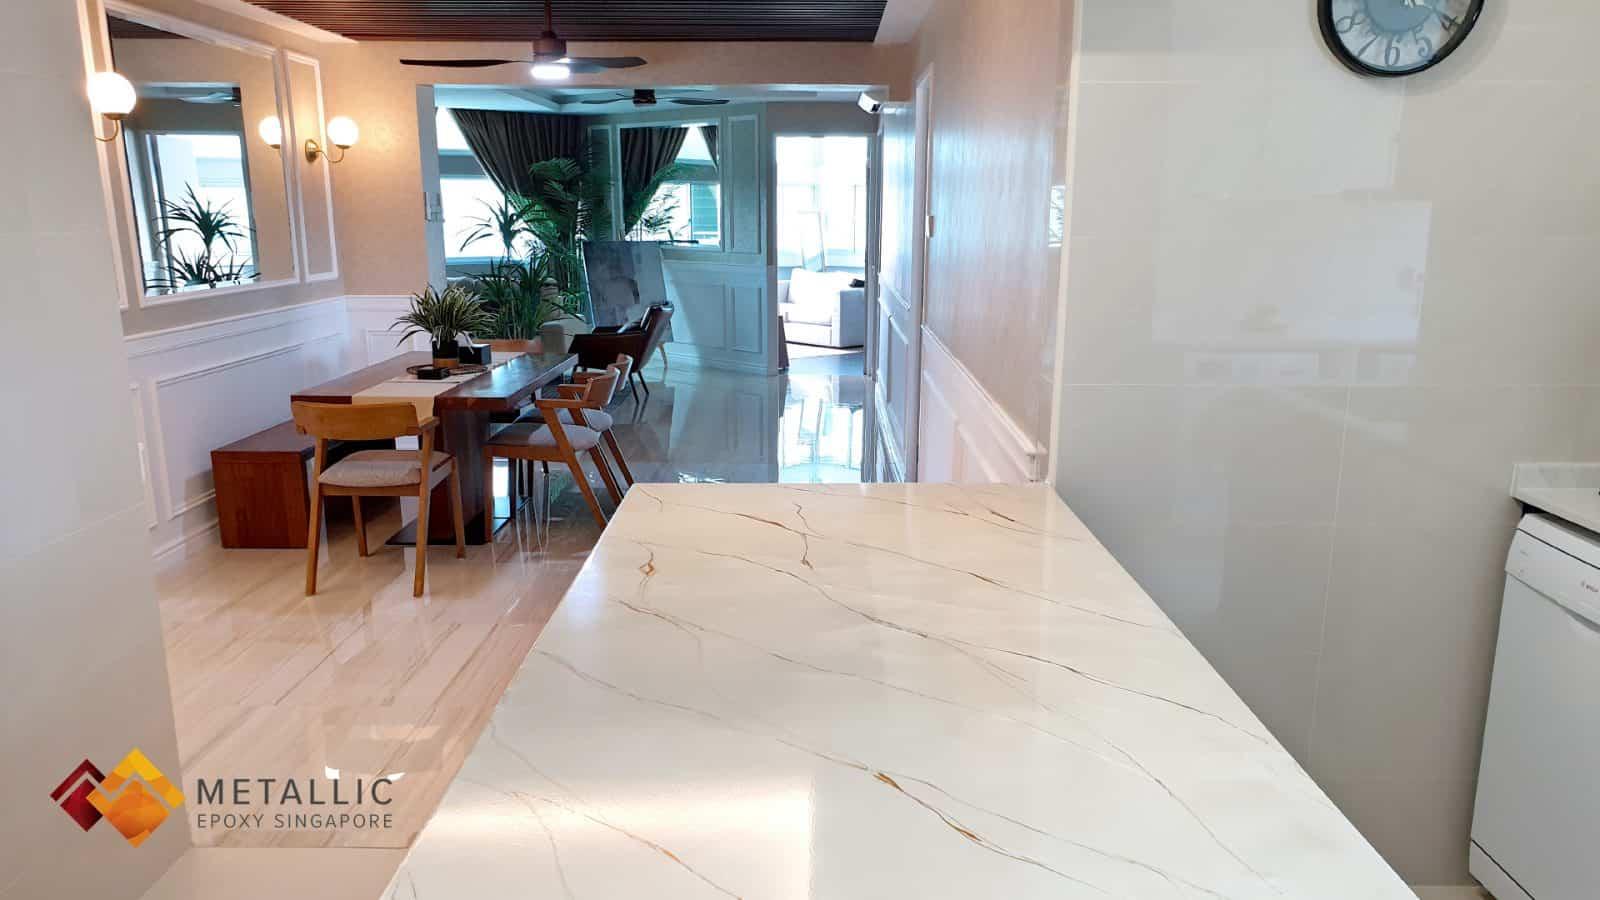 Navajo White Marble Countertop